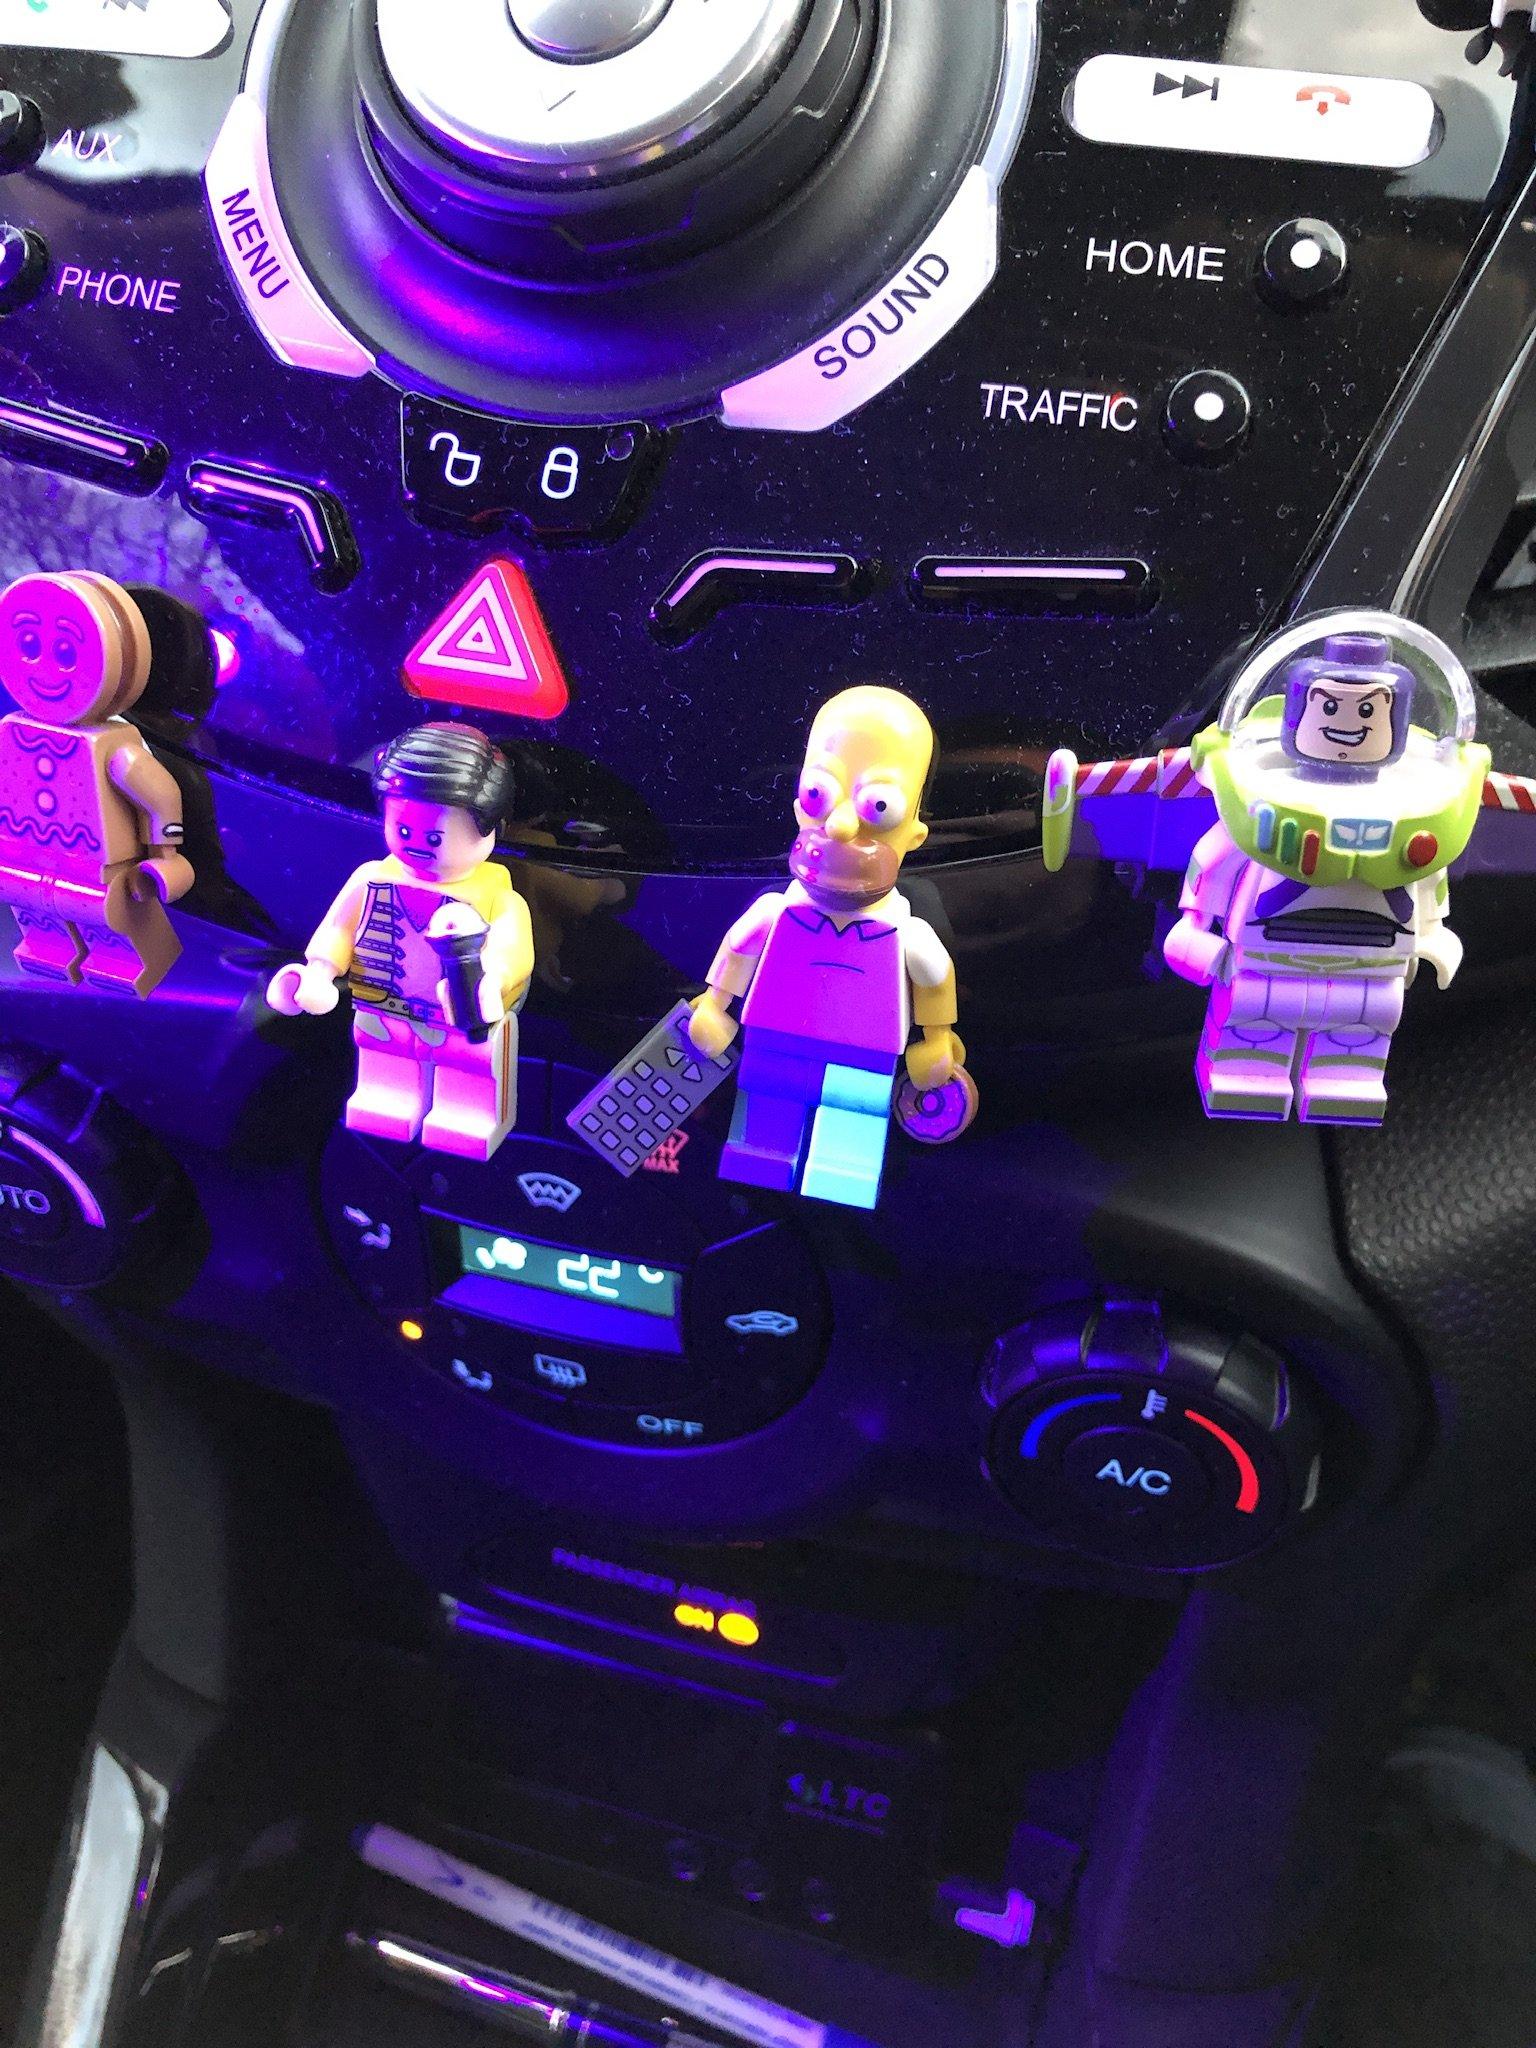 Lego 6  Leg  Legs Lower Parts For Minifigure Figure  Purple